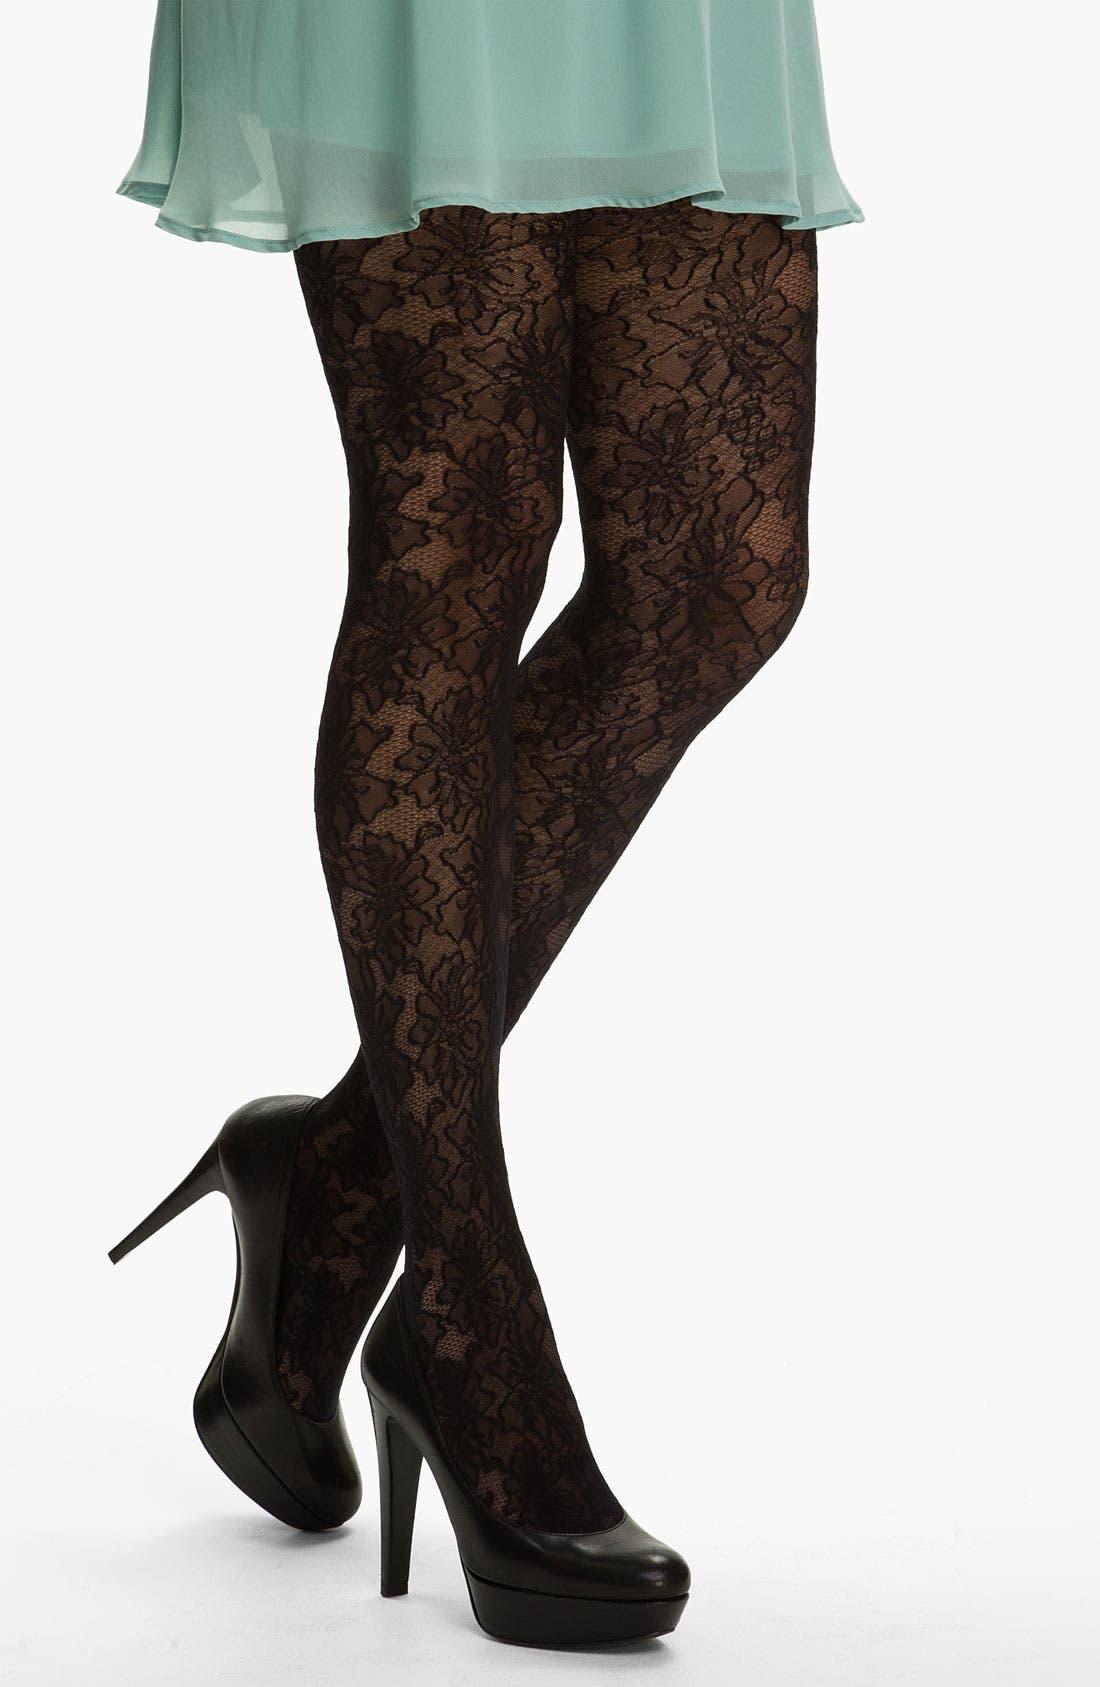 Main Image - Oroblu 'Collant Marie' Pantyhose